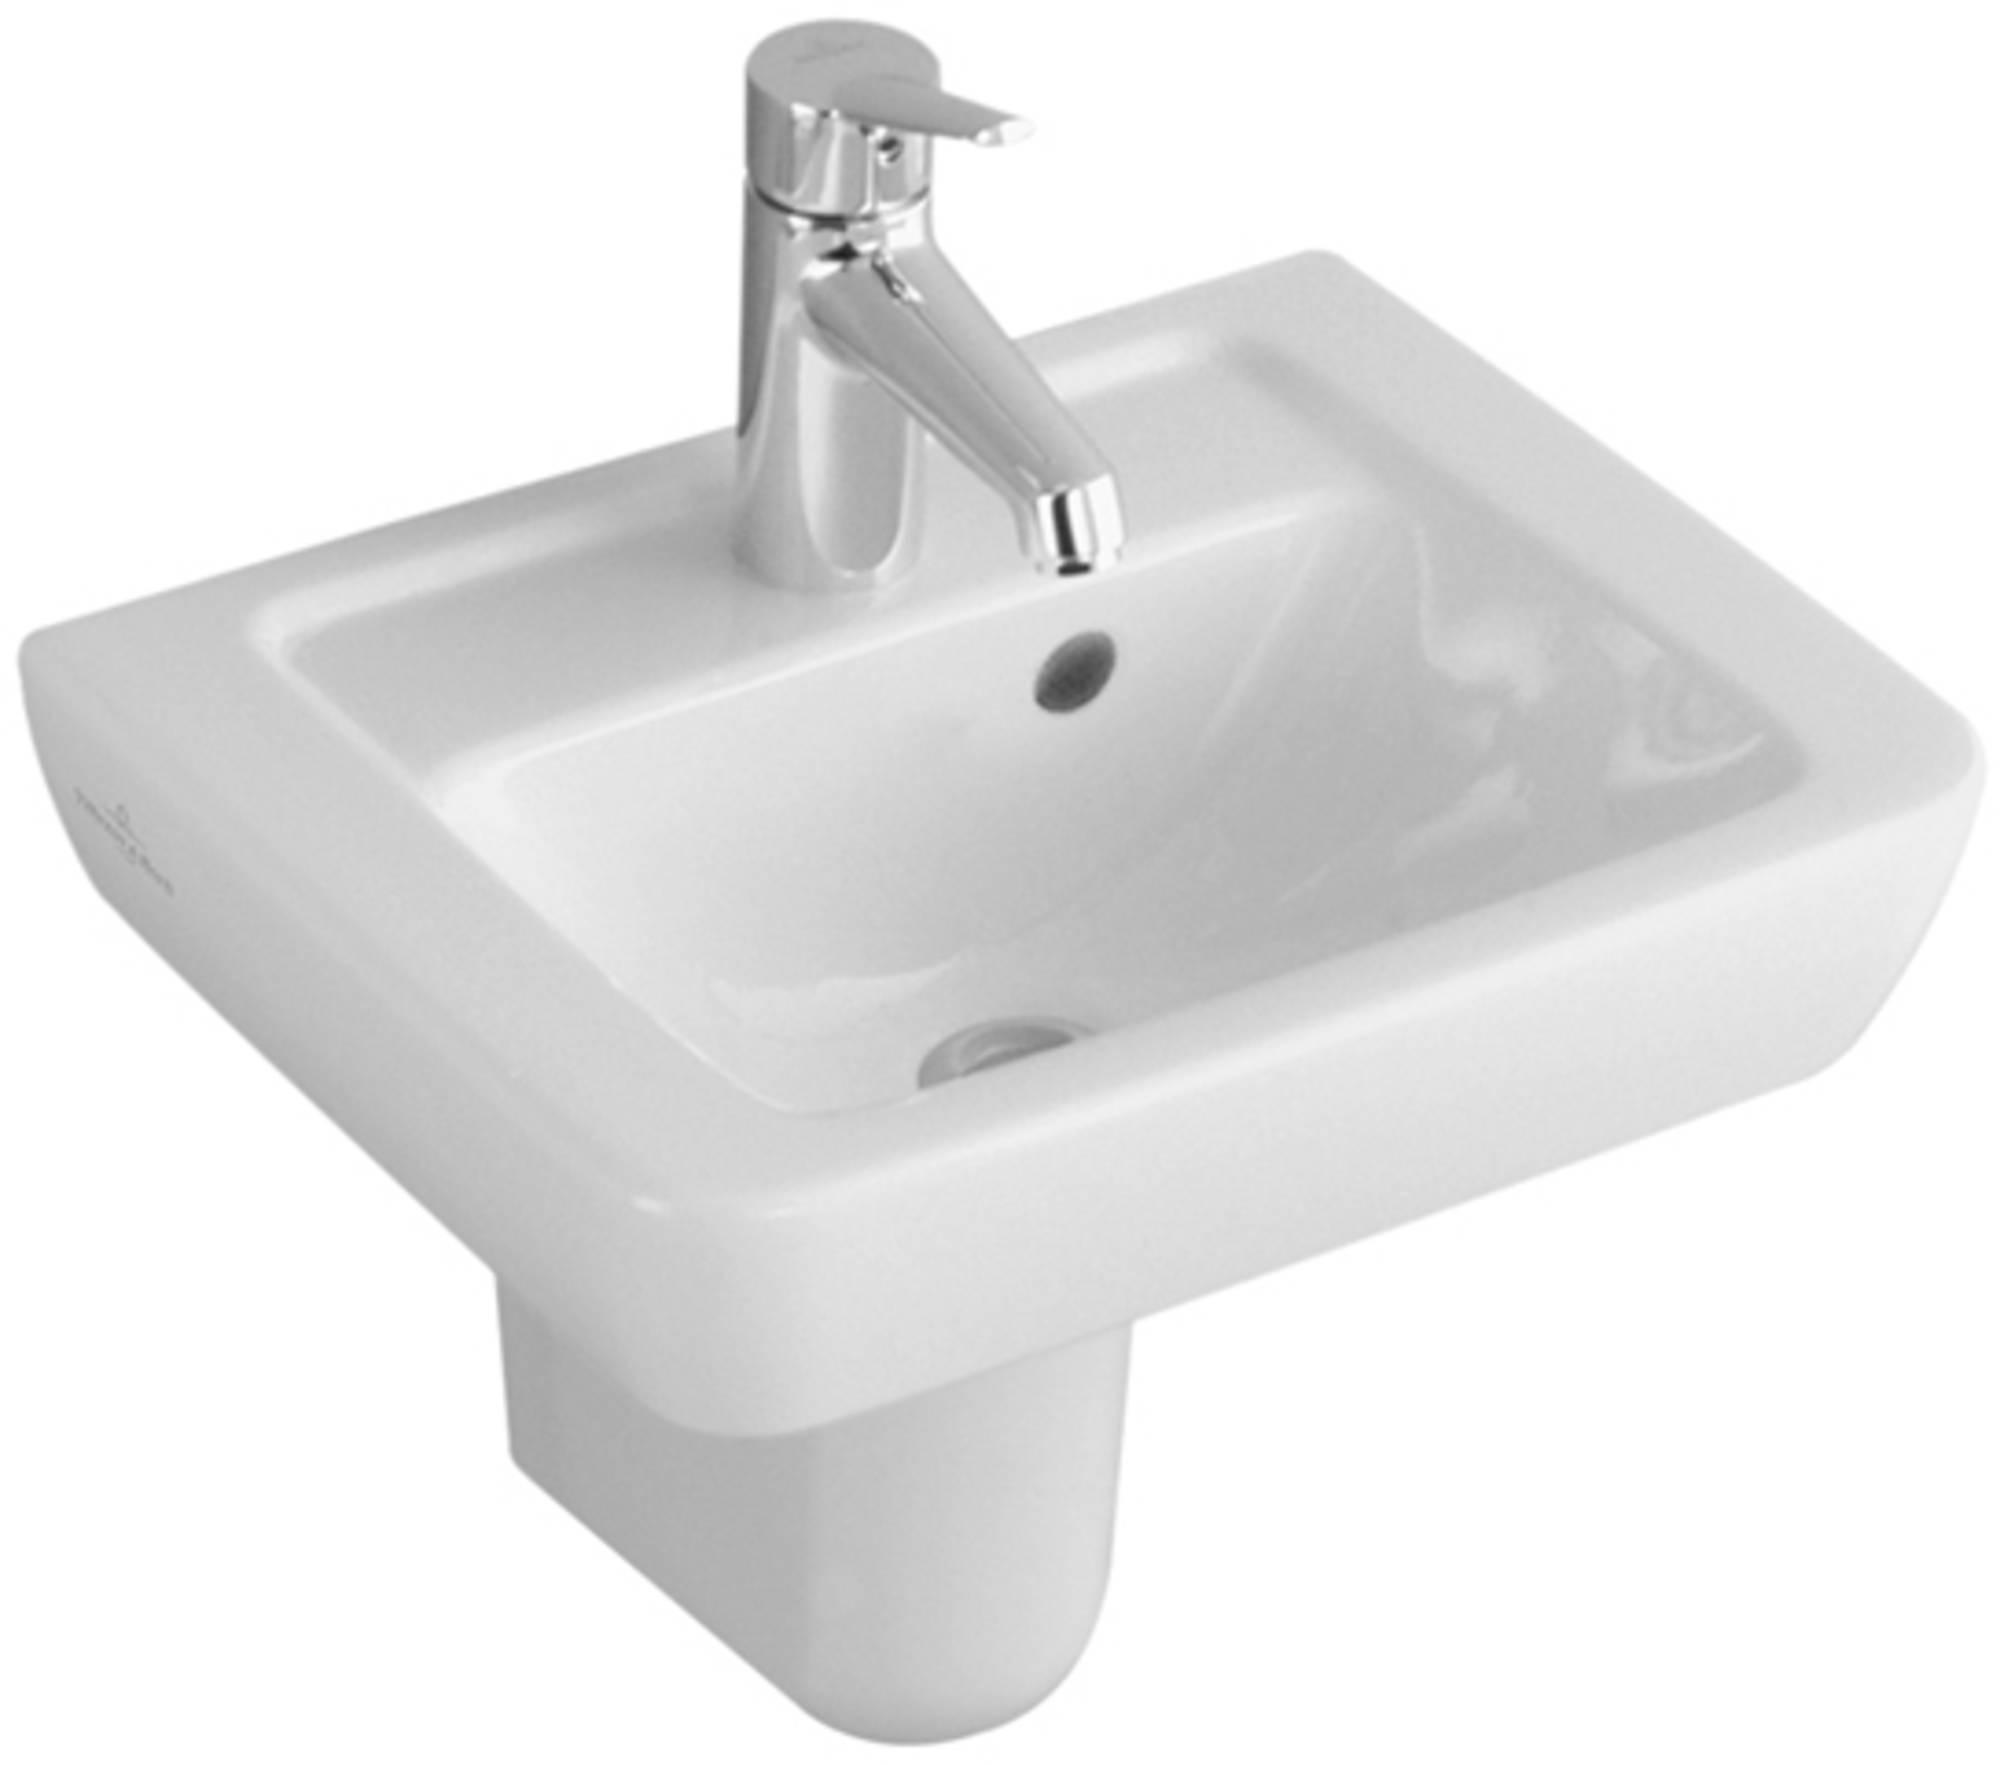 VILLEROY & BOCH SUBWAY 2.0 sifonkap voor fontein+wastafel compact ceramicplus WIT (724400R1)